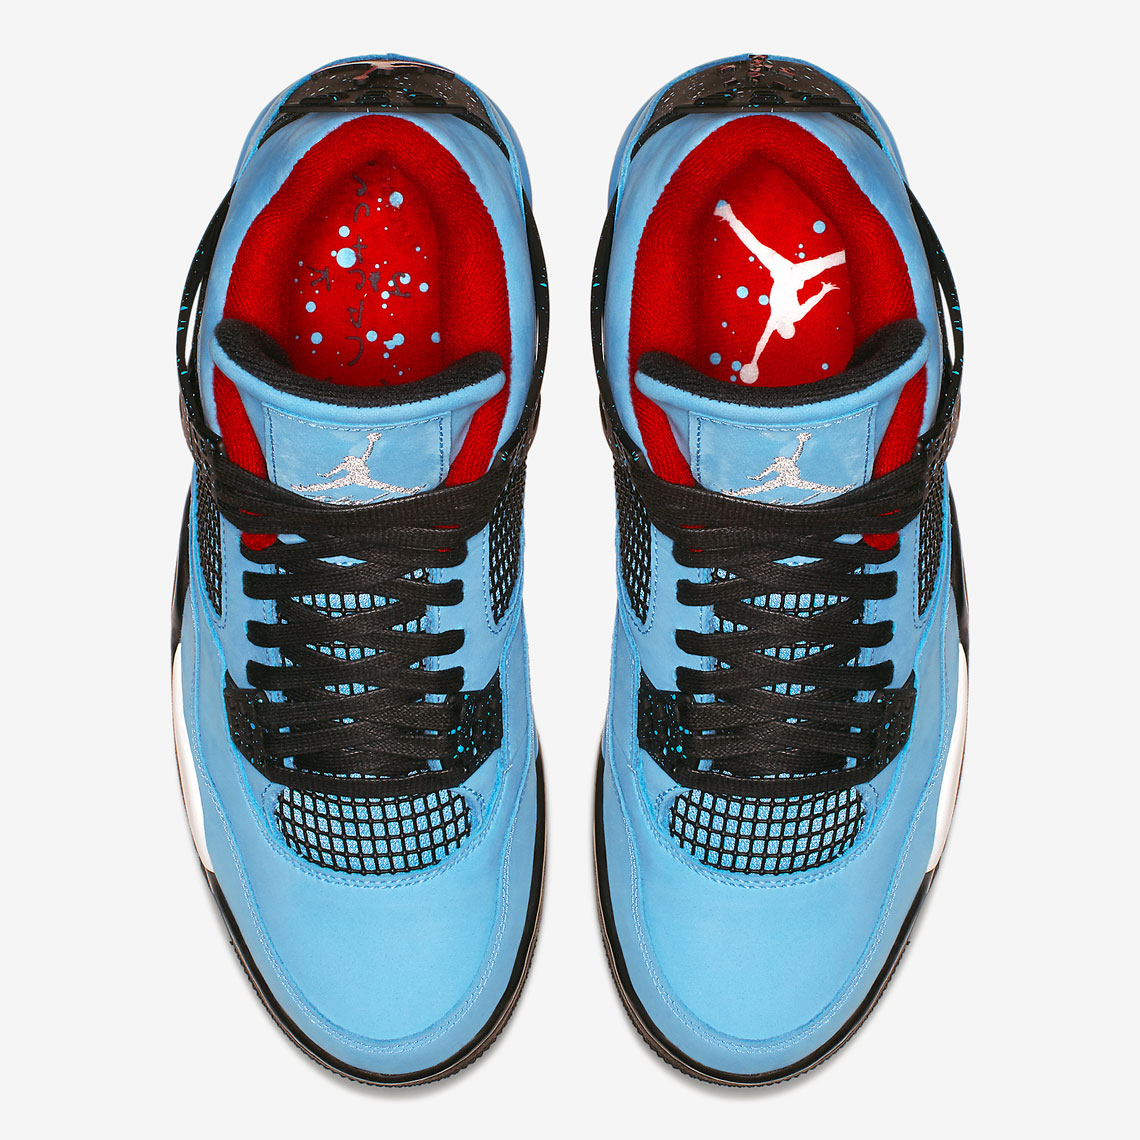 822aa77b8eceda Travis Scott x Air Jordan 4 Release Info